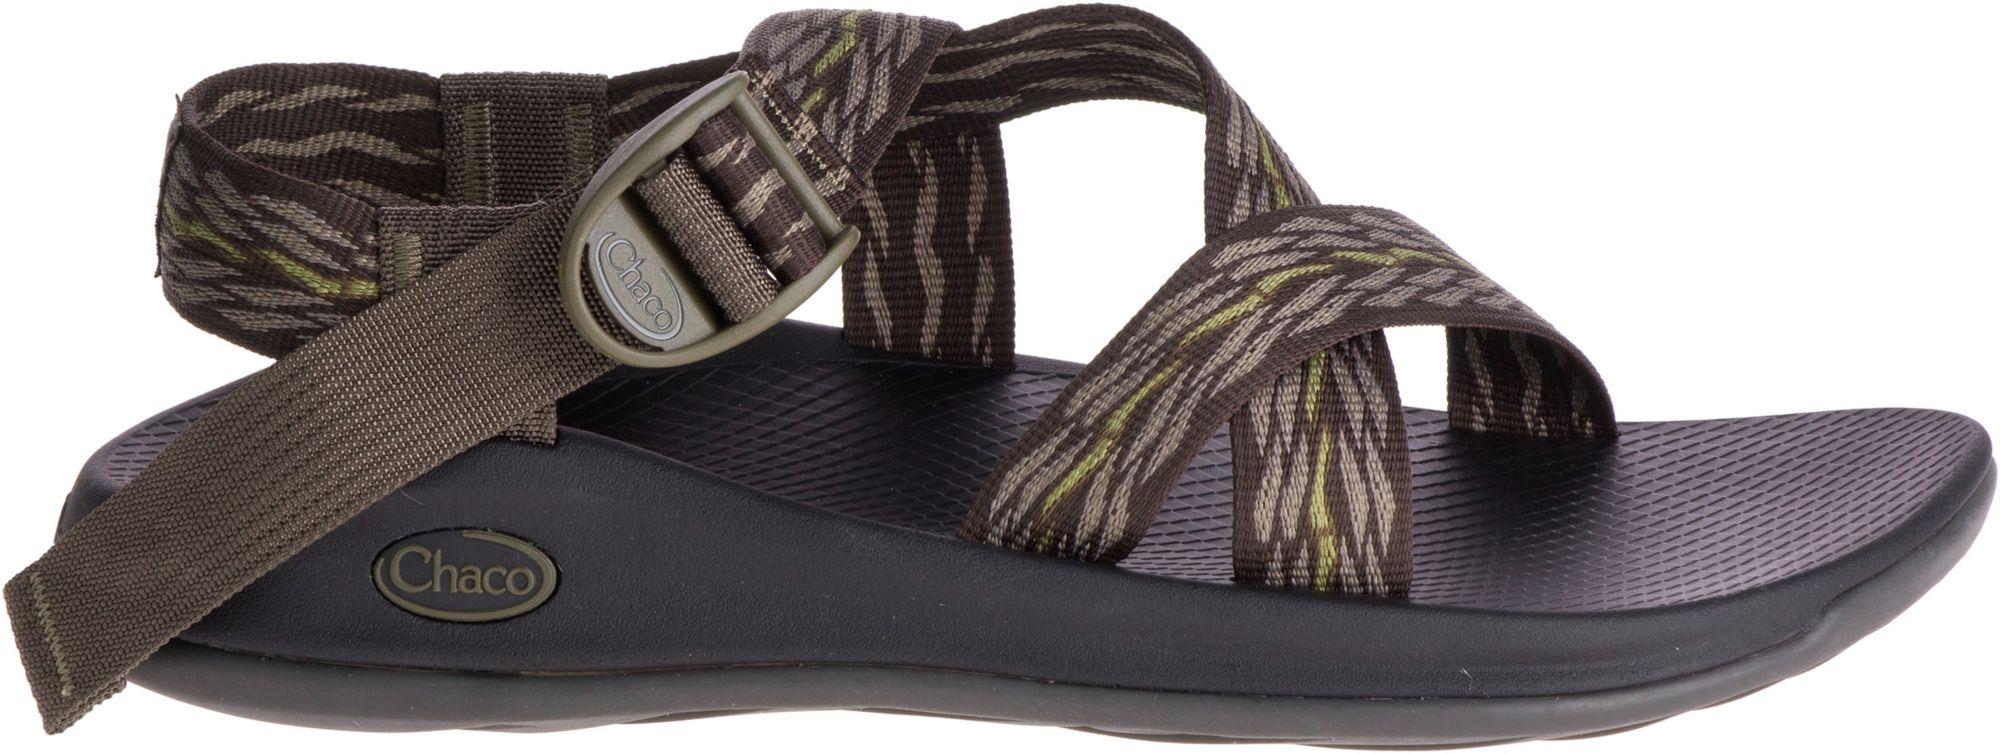 24c73a7f5615 Chaco Men s Z Eddy X1 Sandals